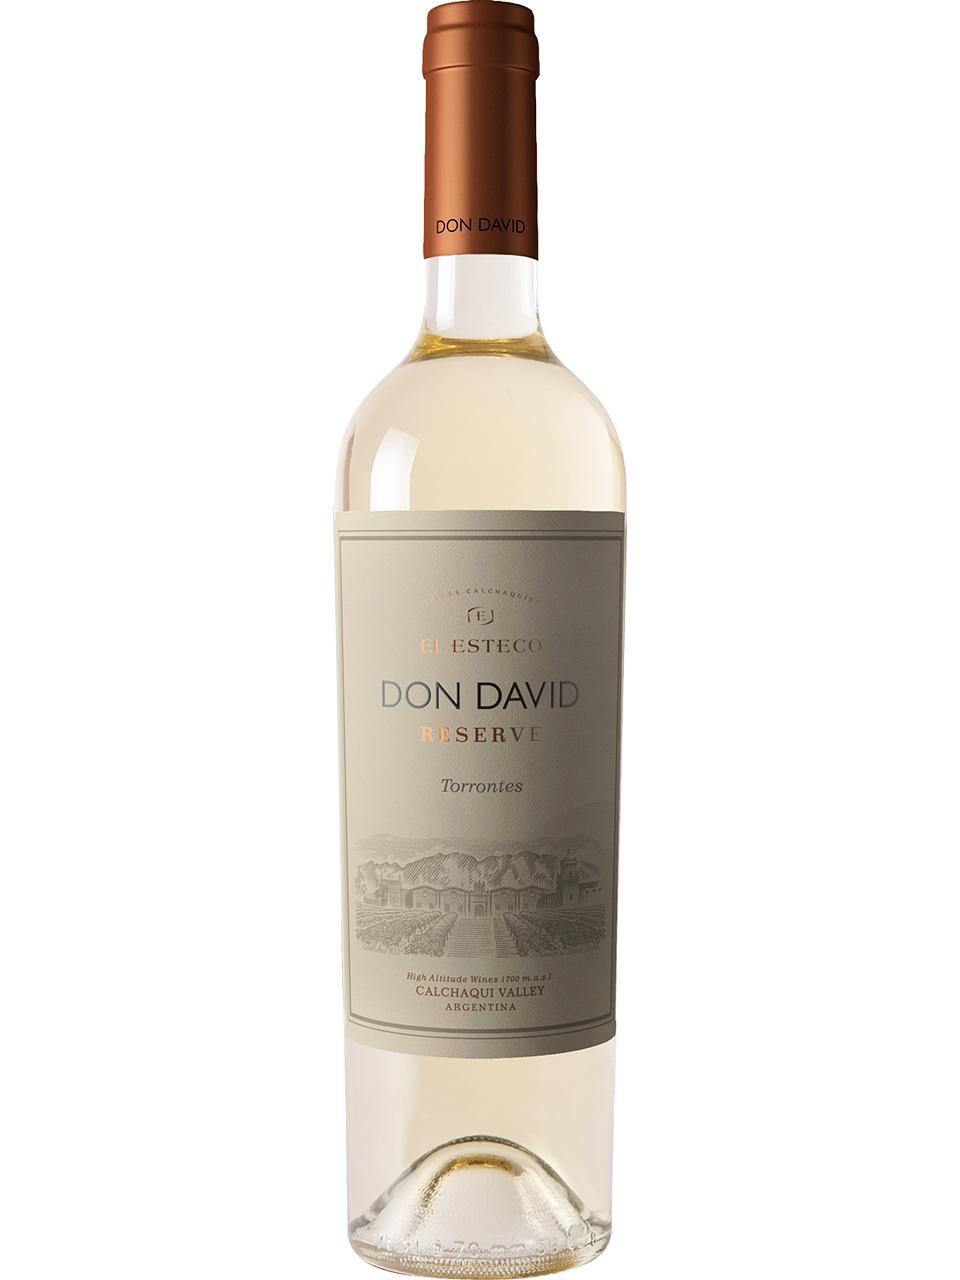 Don David Torrontes Reserve